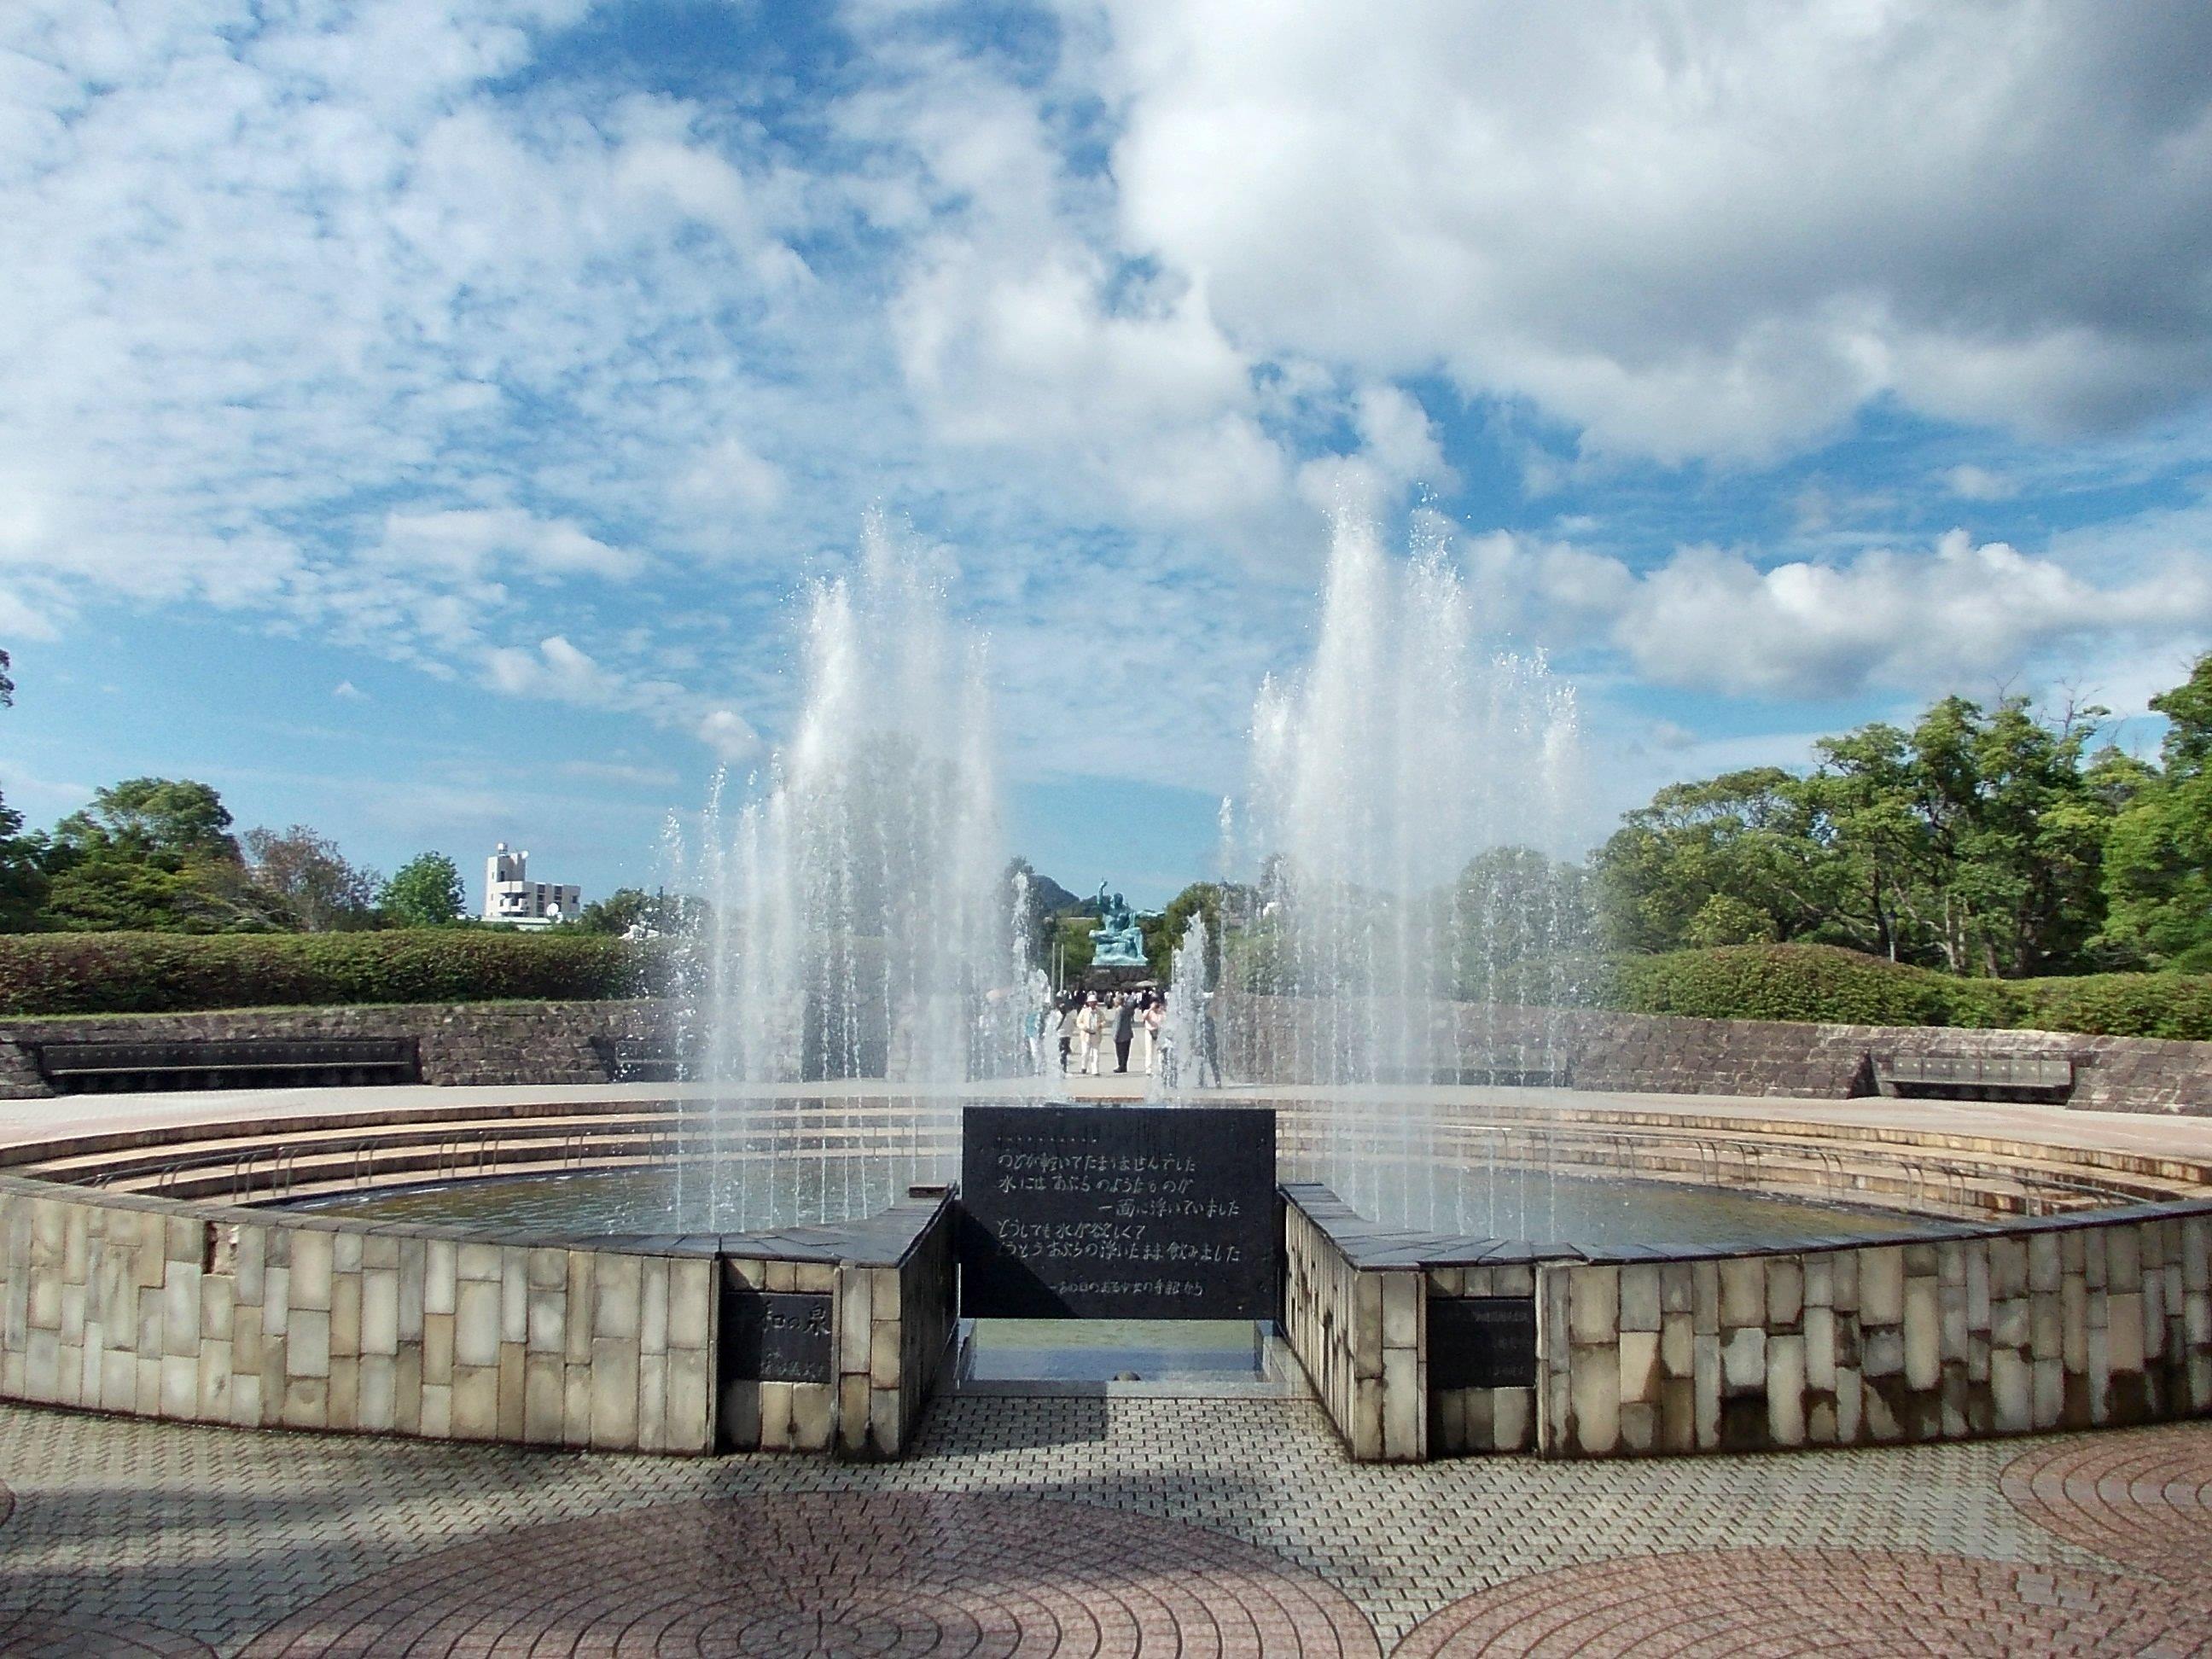 File:Fountain at Nagasaki Peace Park.jpg - Wikimedia Commons